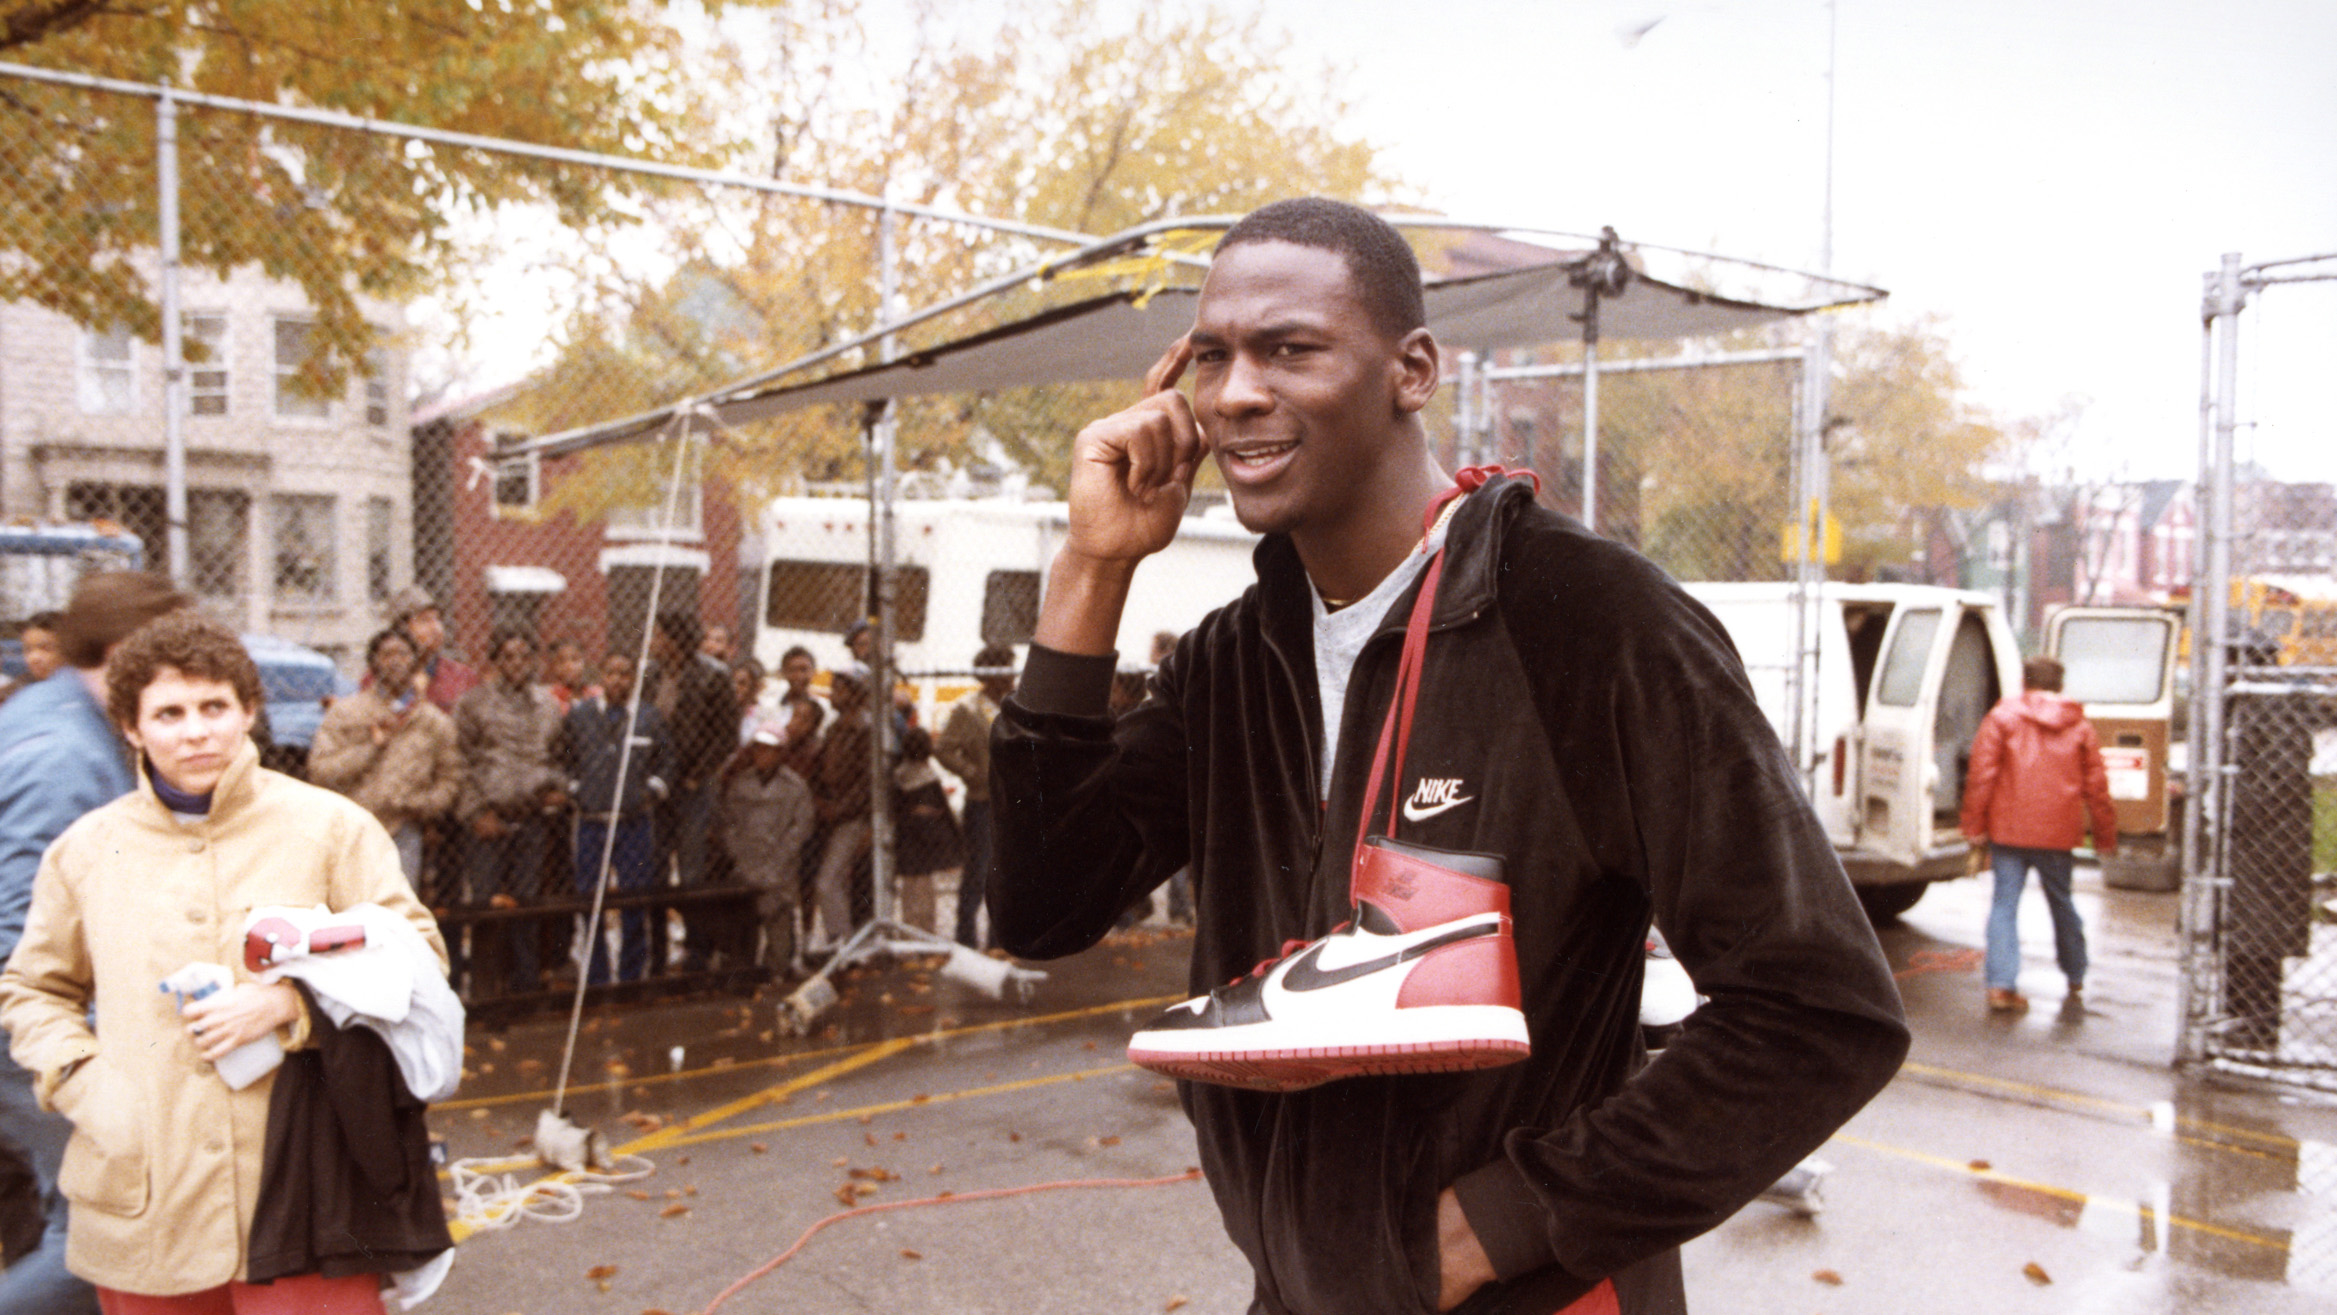 Sweatsuit Jordan Toe Black With News 1 Nike Stockx Air BWrdxQoeC